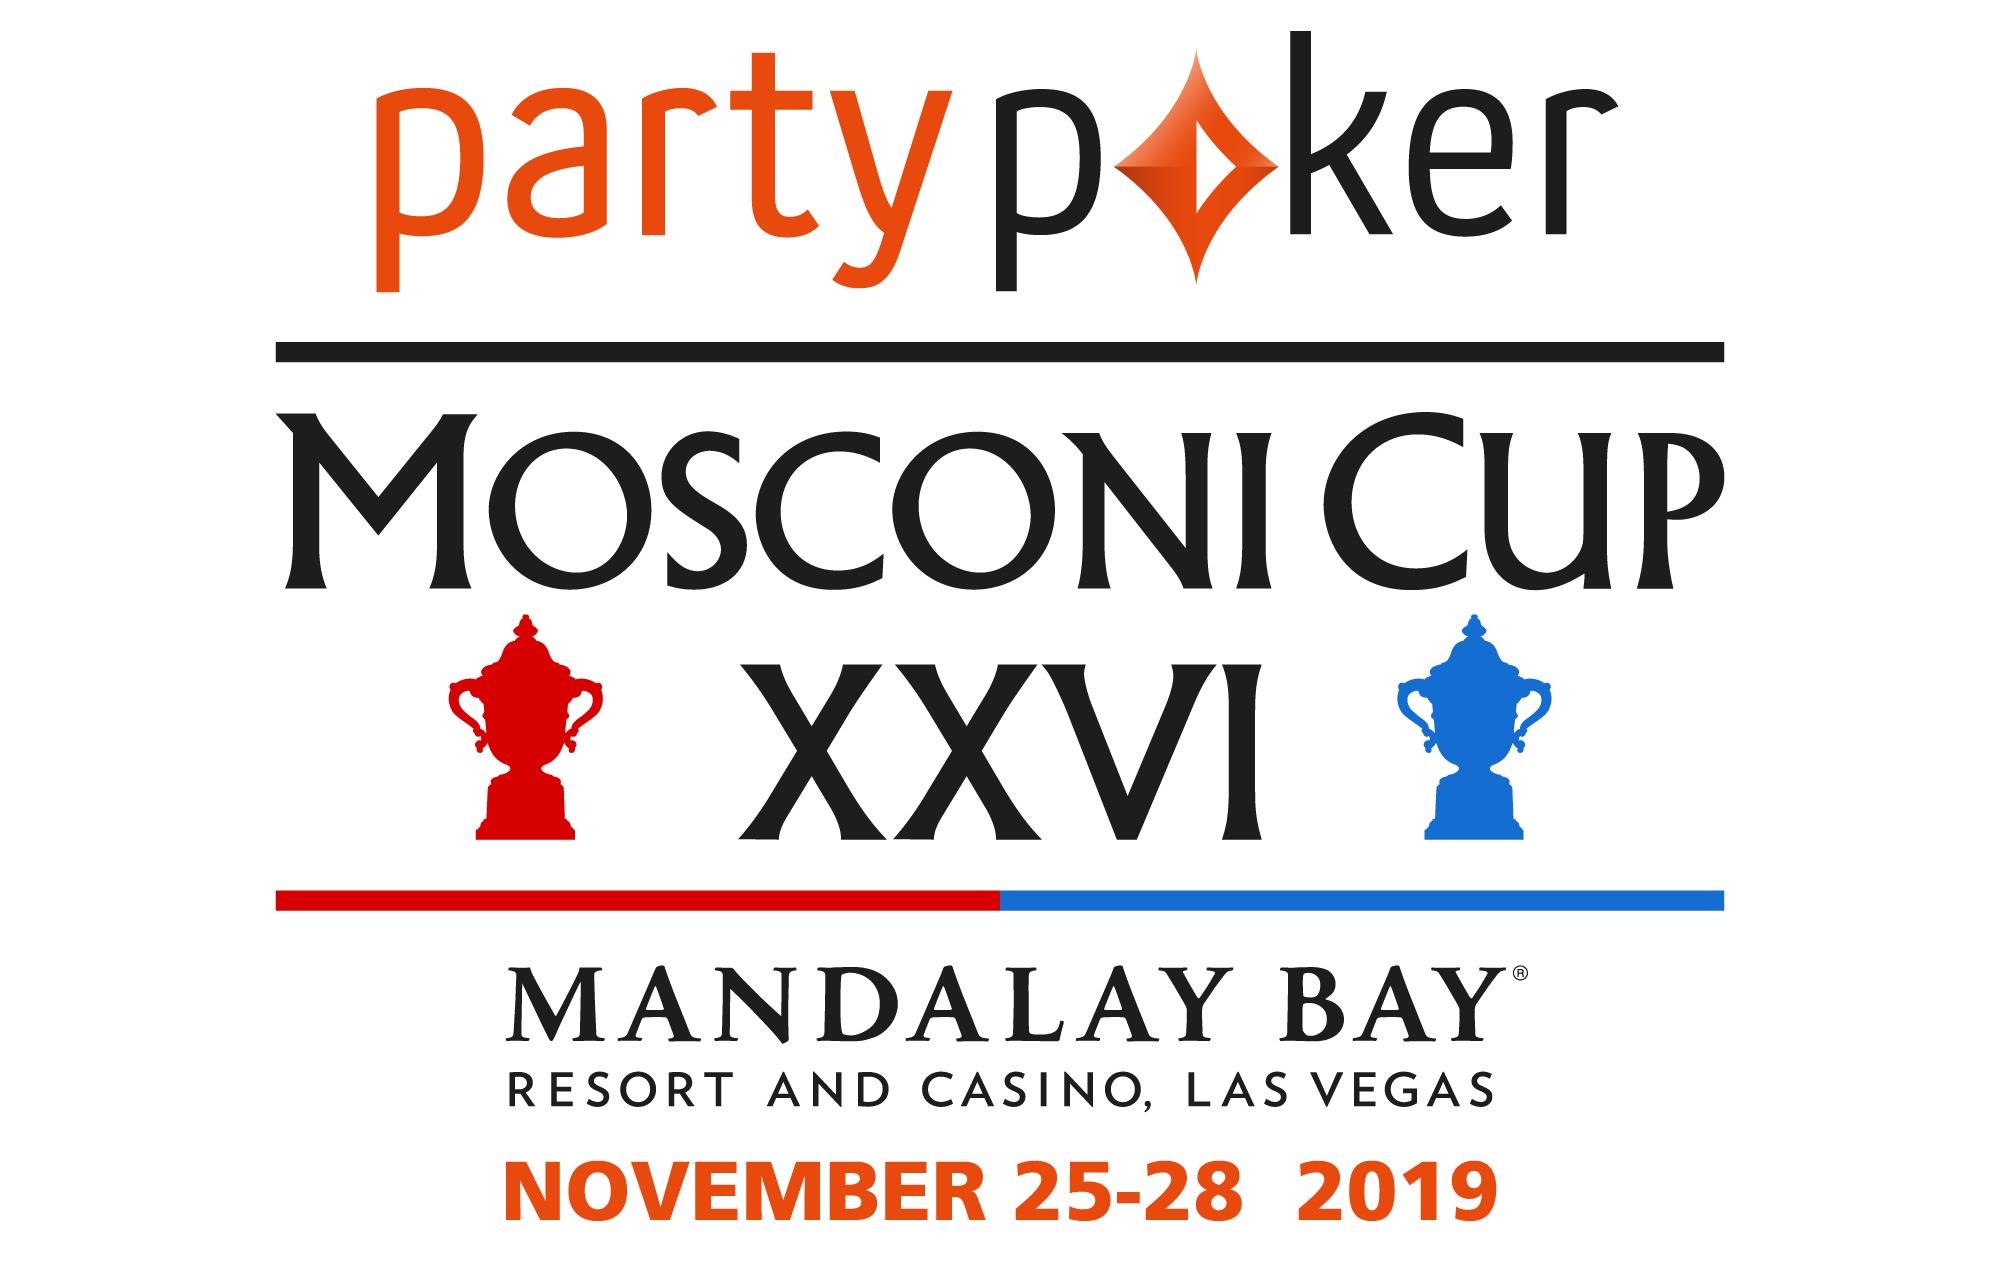 Mosconi Cup XXVI